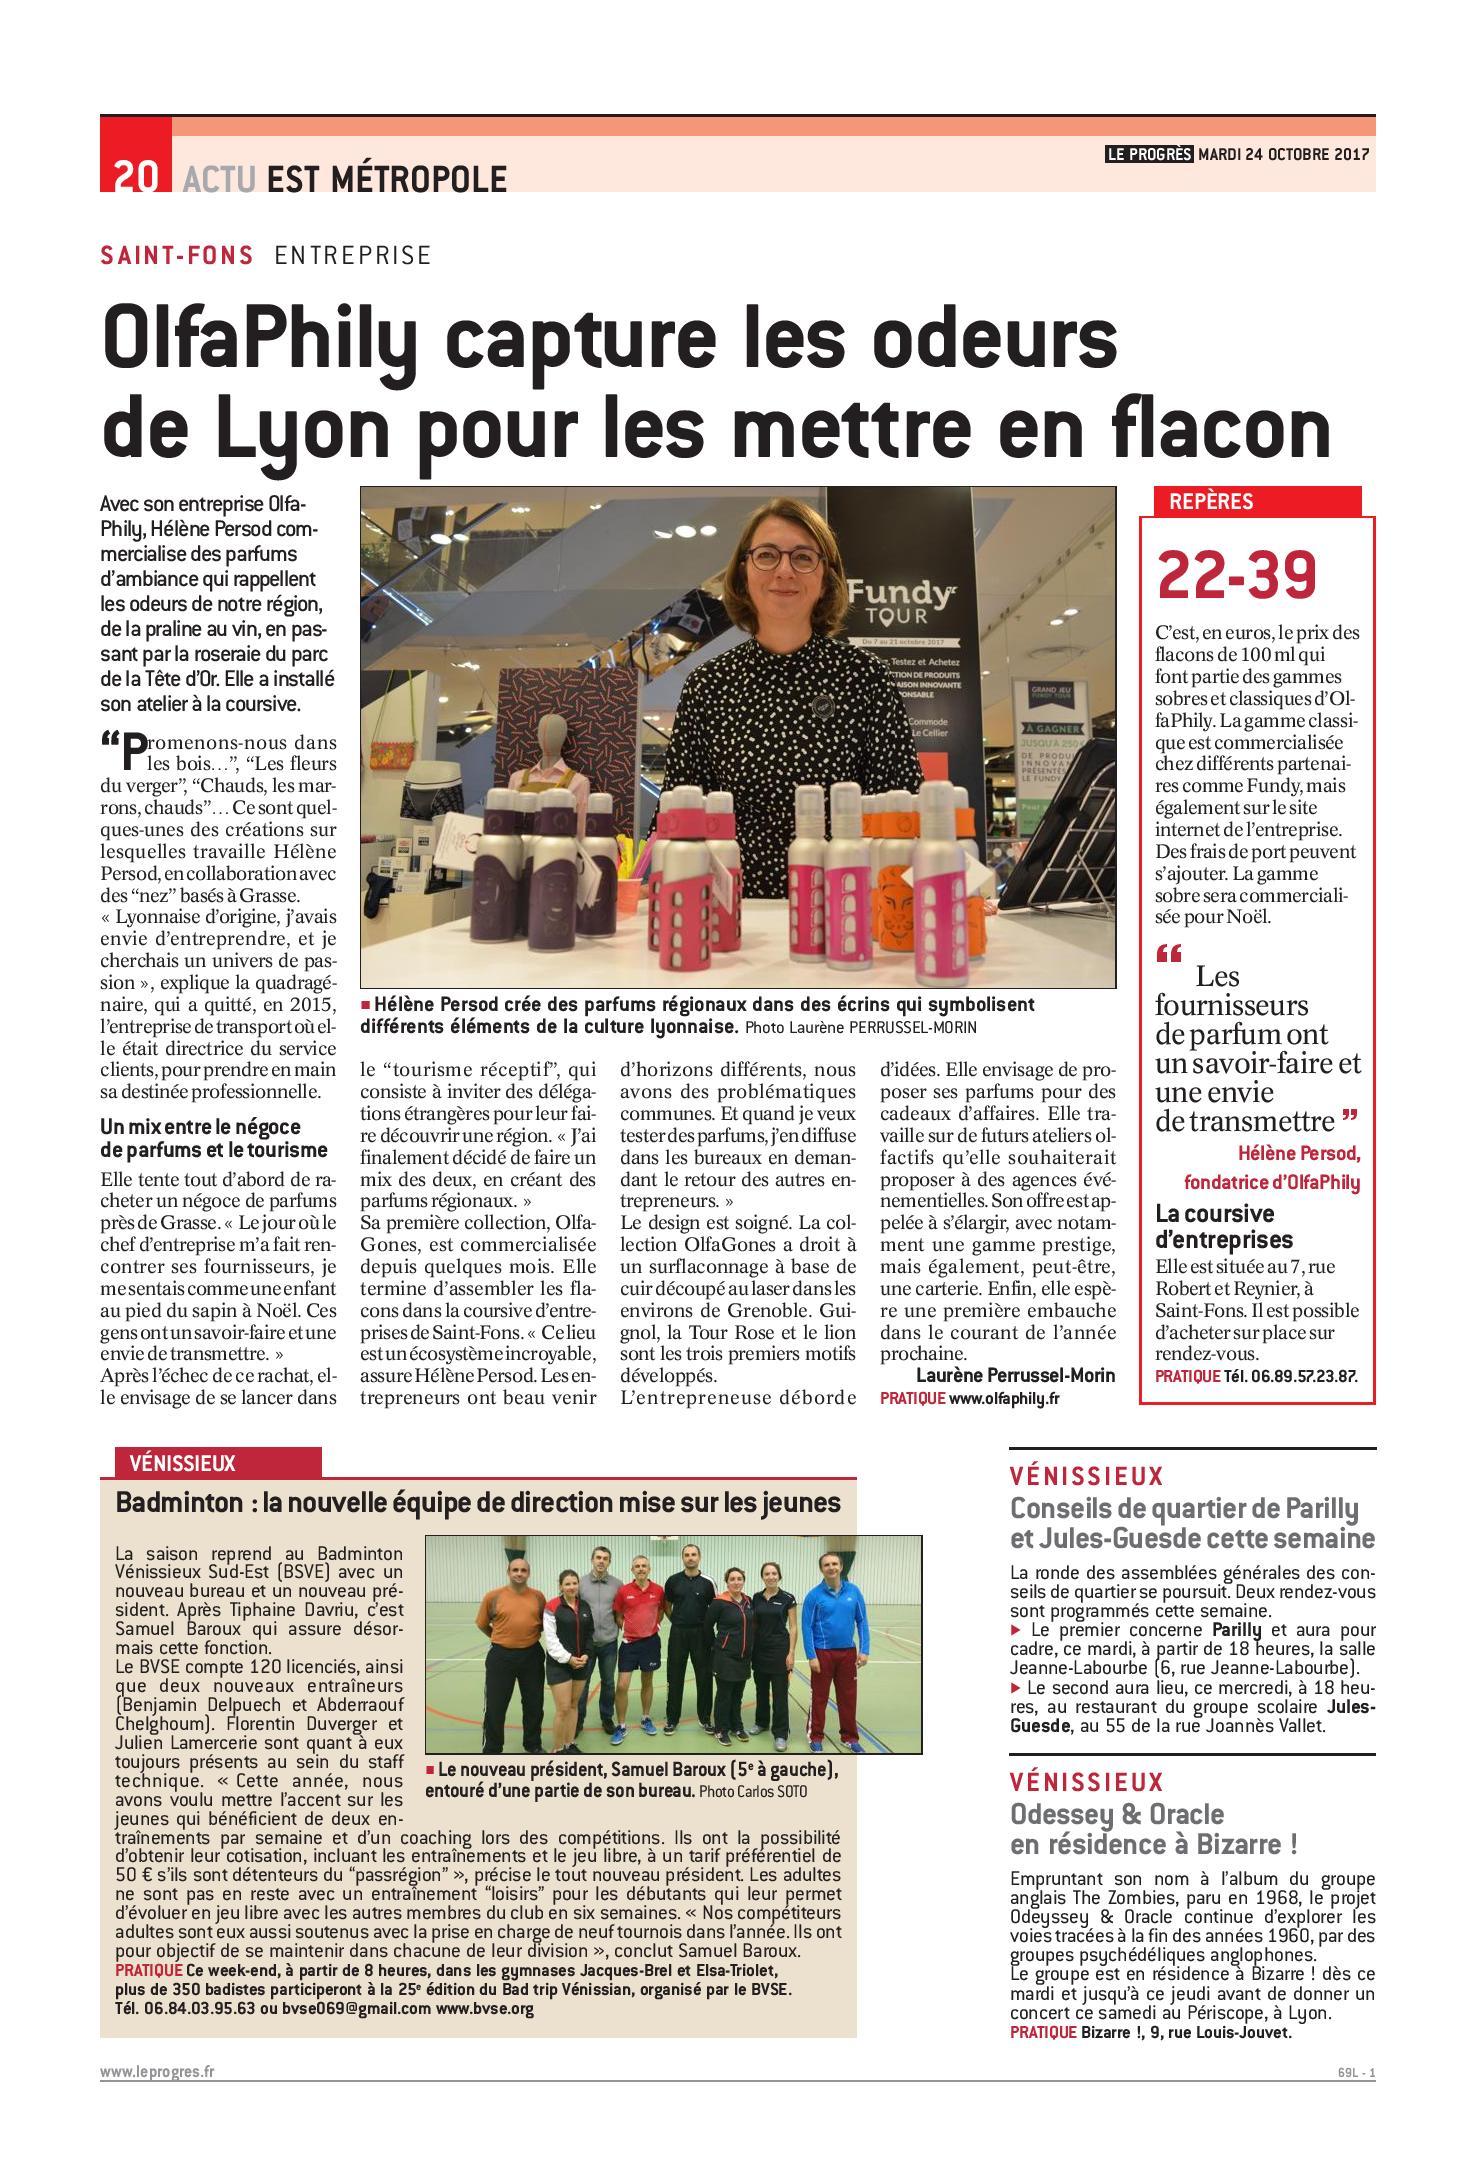 OlfaPhily Odeurs de Lyon en flacons